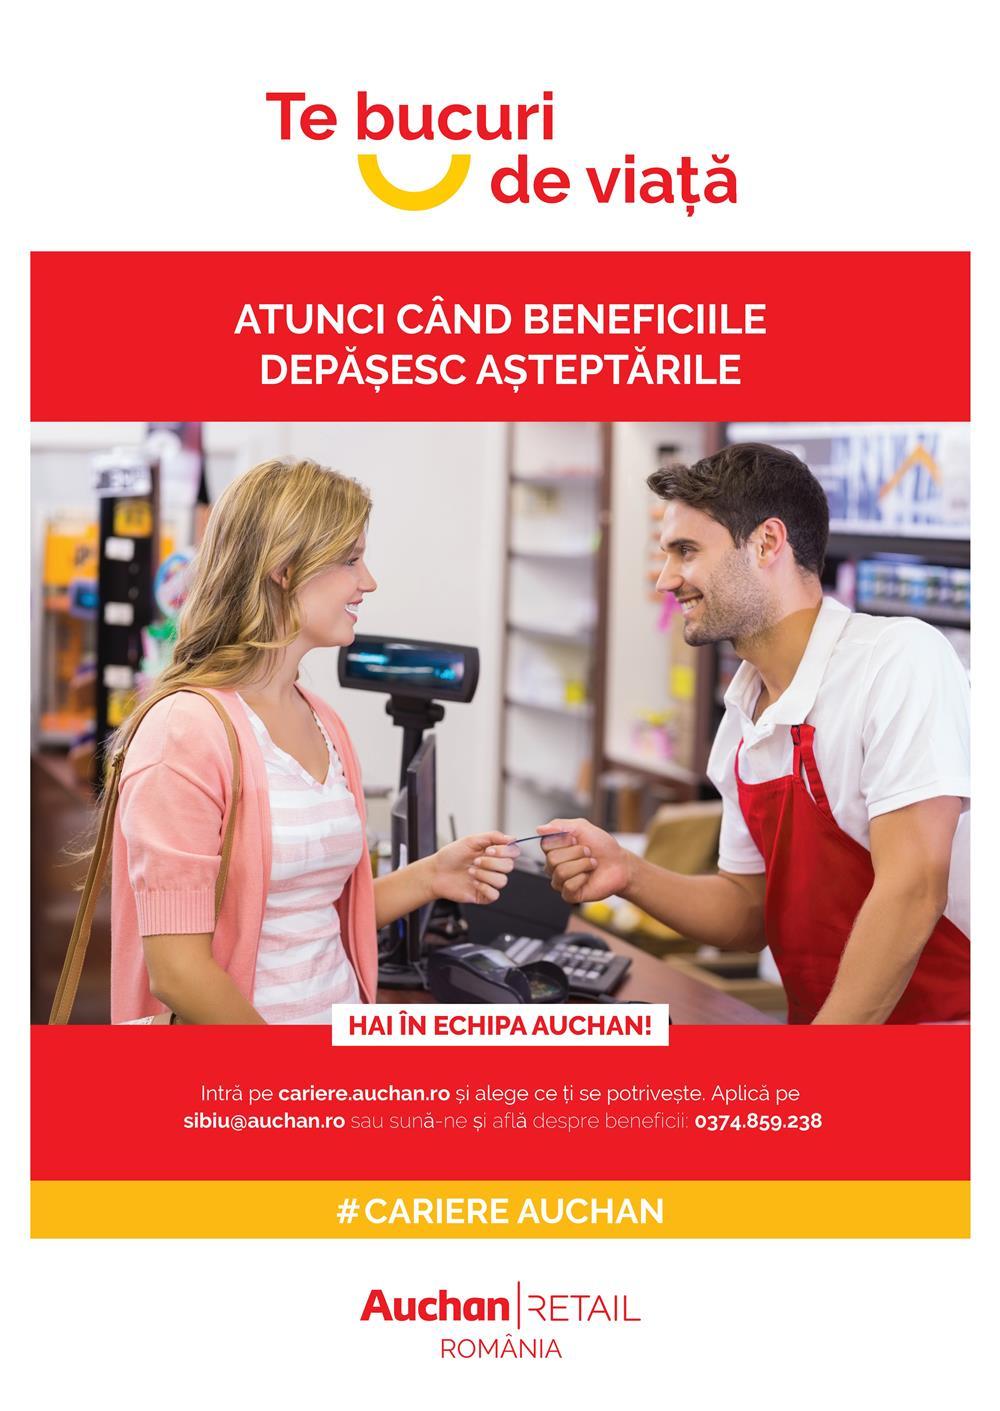 Auchan Sibiu recruteaza Consilier Vanzari Electronice. Vino in echipa noastra!